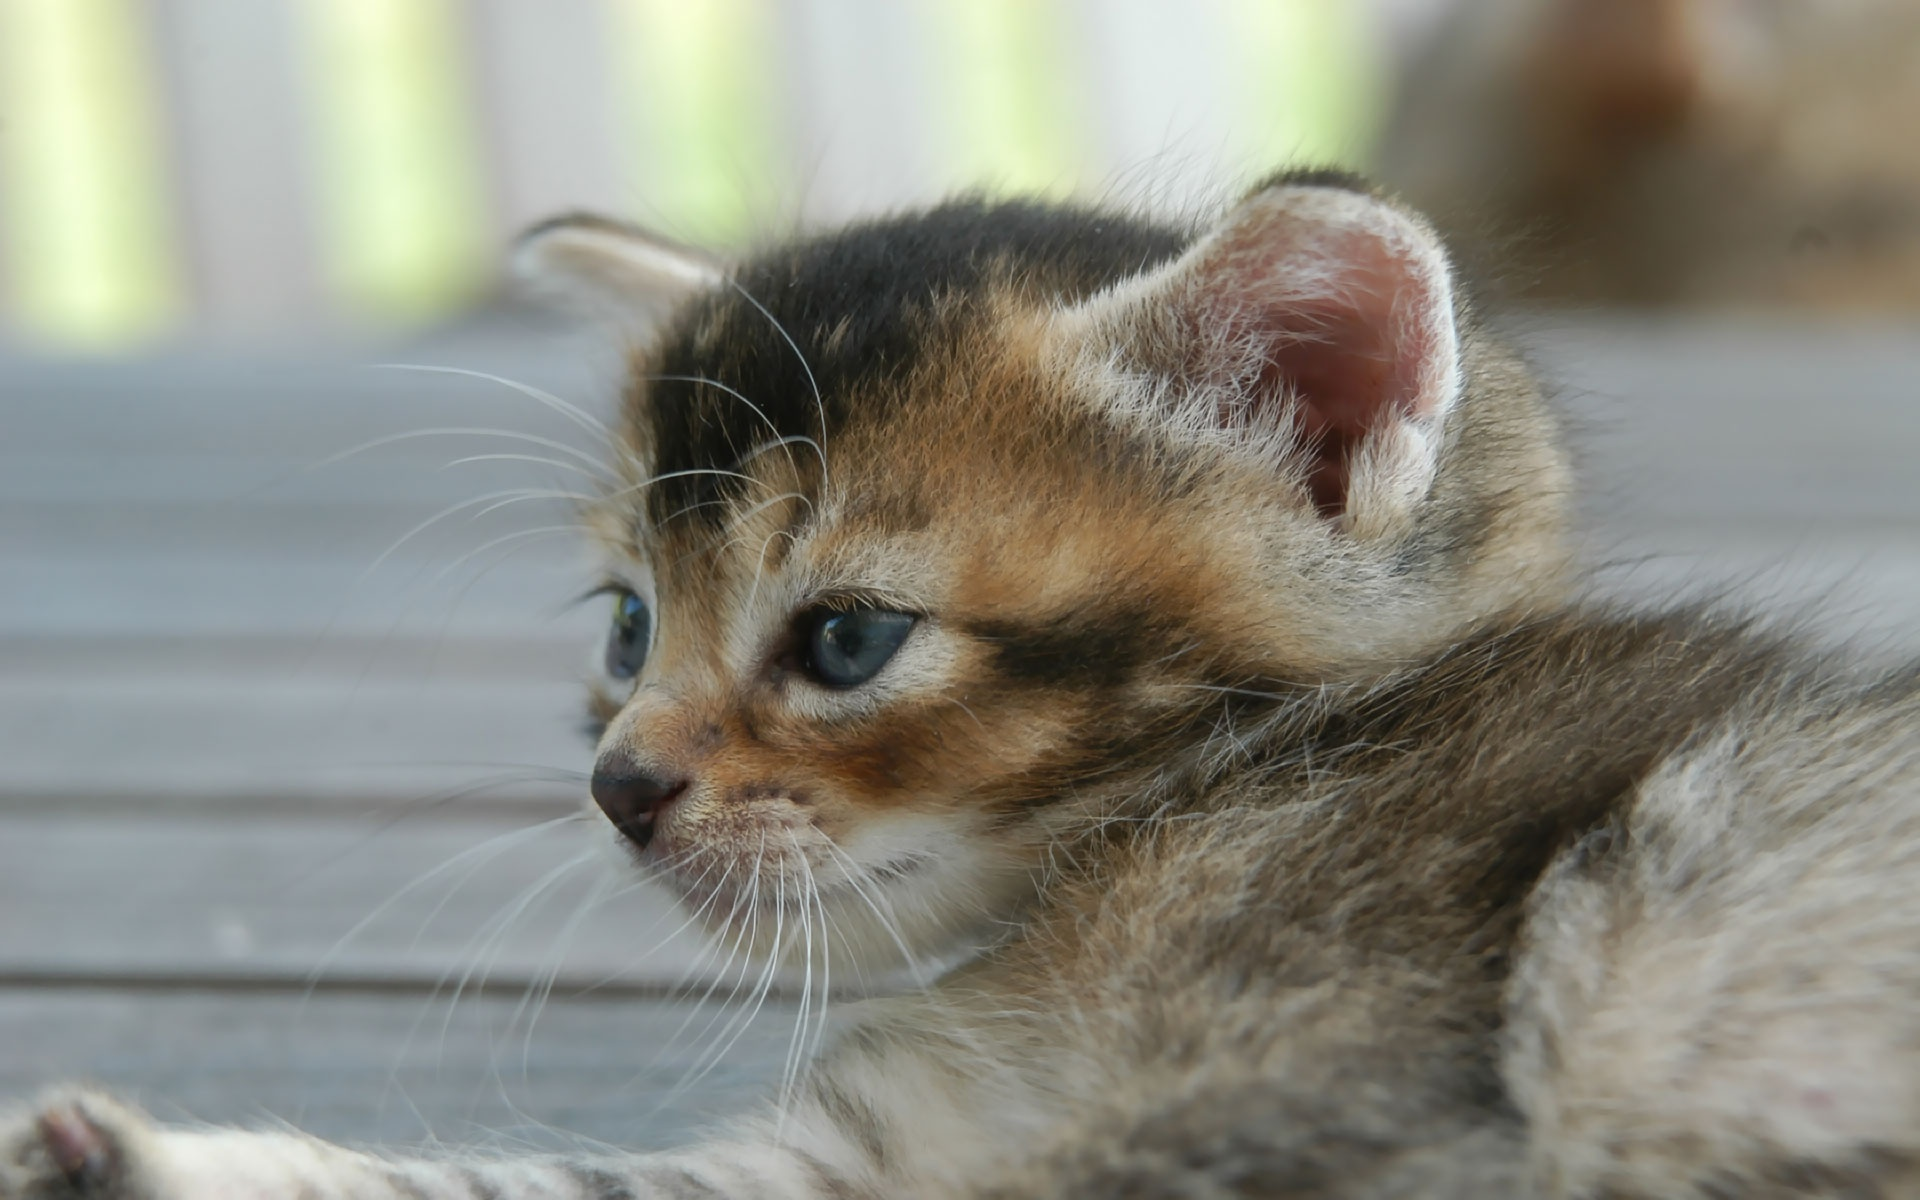 Kitten Cute Background Desktop Wallpaper 1920x1200px